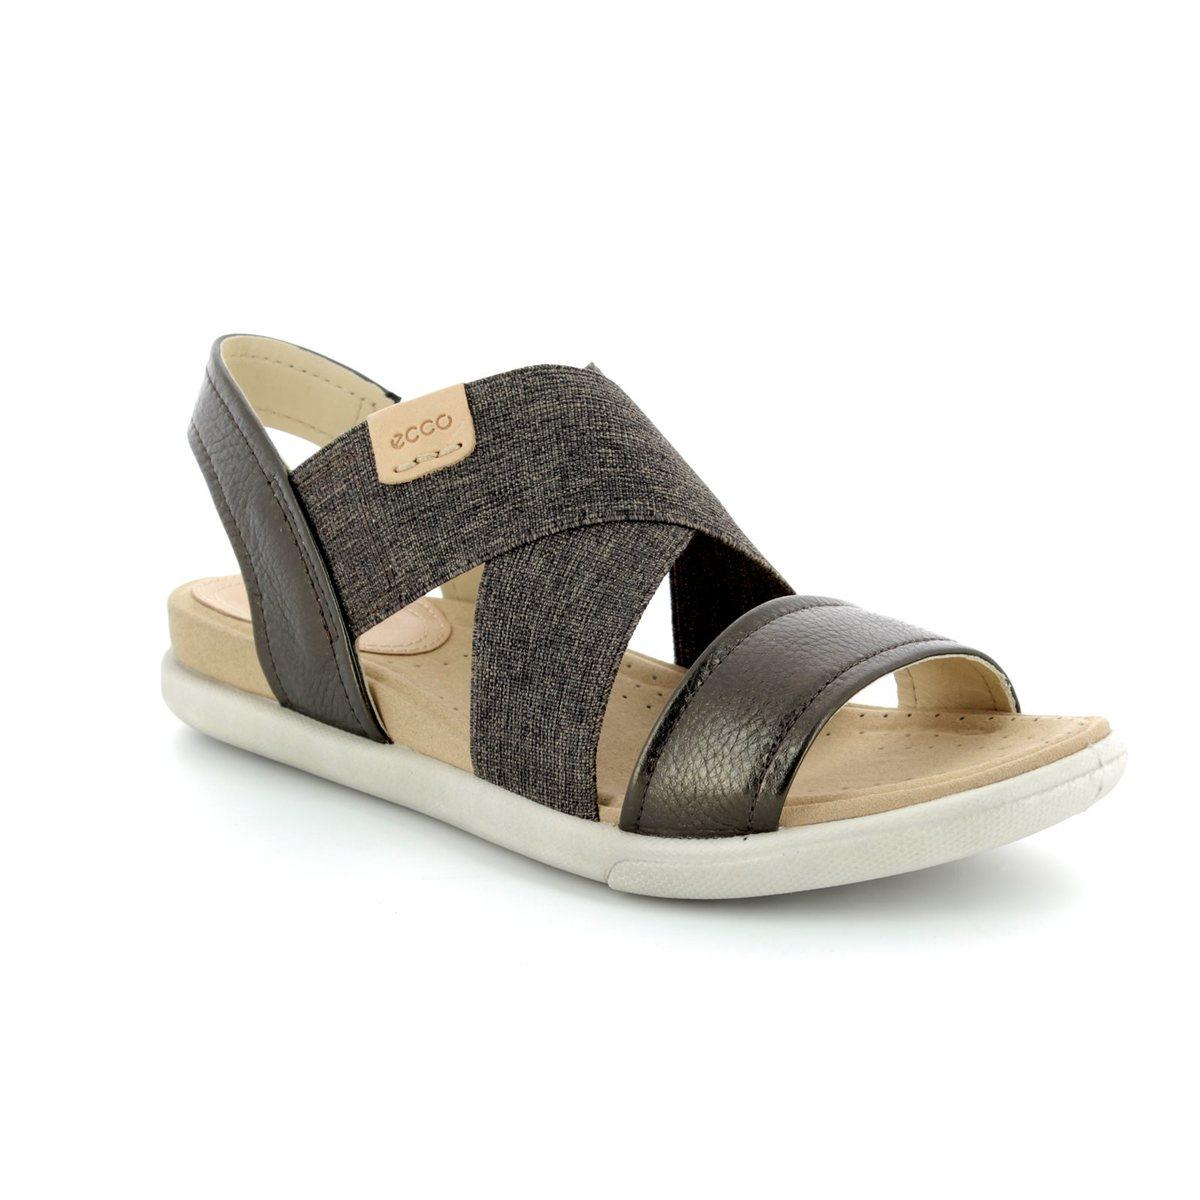 dcb40829c7ff ECCO Sandals - Pewter - 248223 50533 DAMARA SANDAL